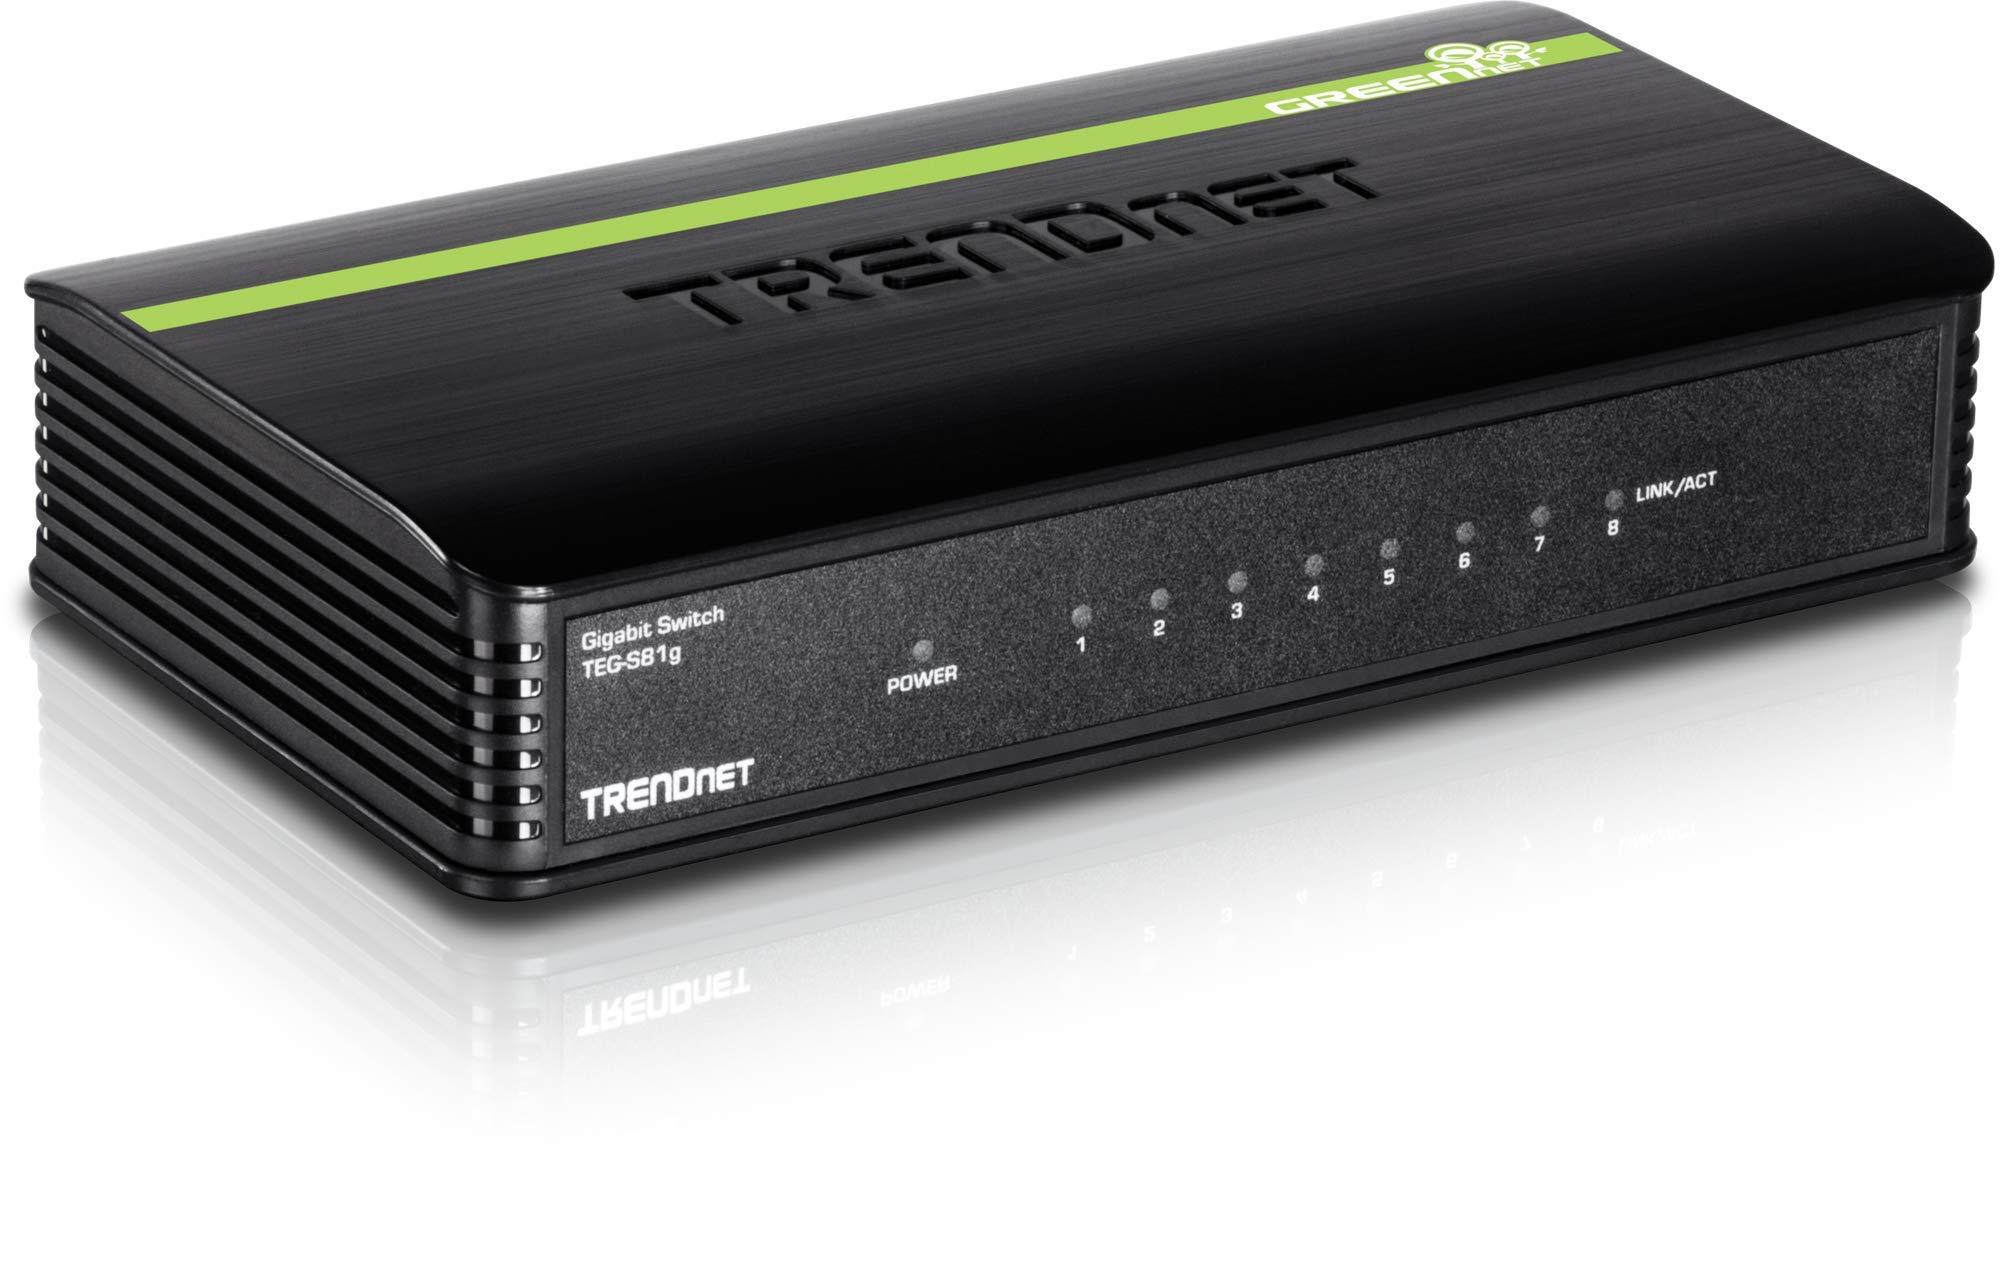 TRENDnet 8-Port Unmanaged Gigabit GREENnet Desktop Switch, 16 Gbps Switching Fabric, TEG-S81G by TRENDnet